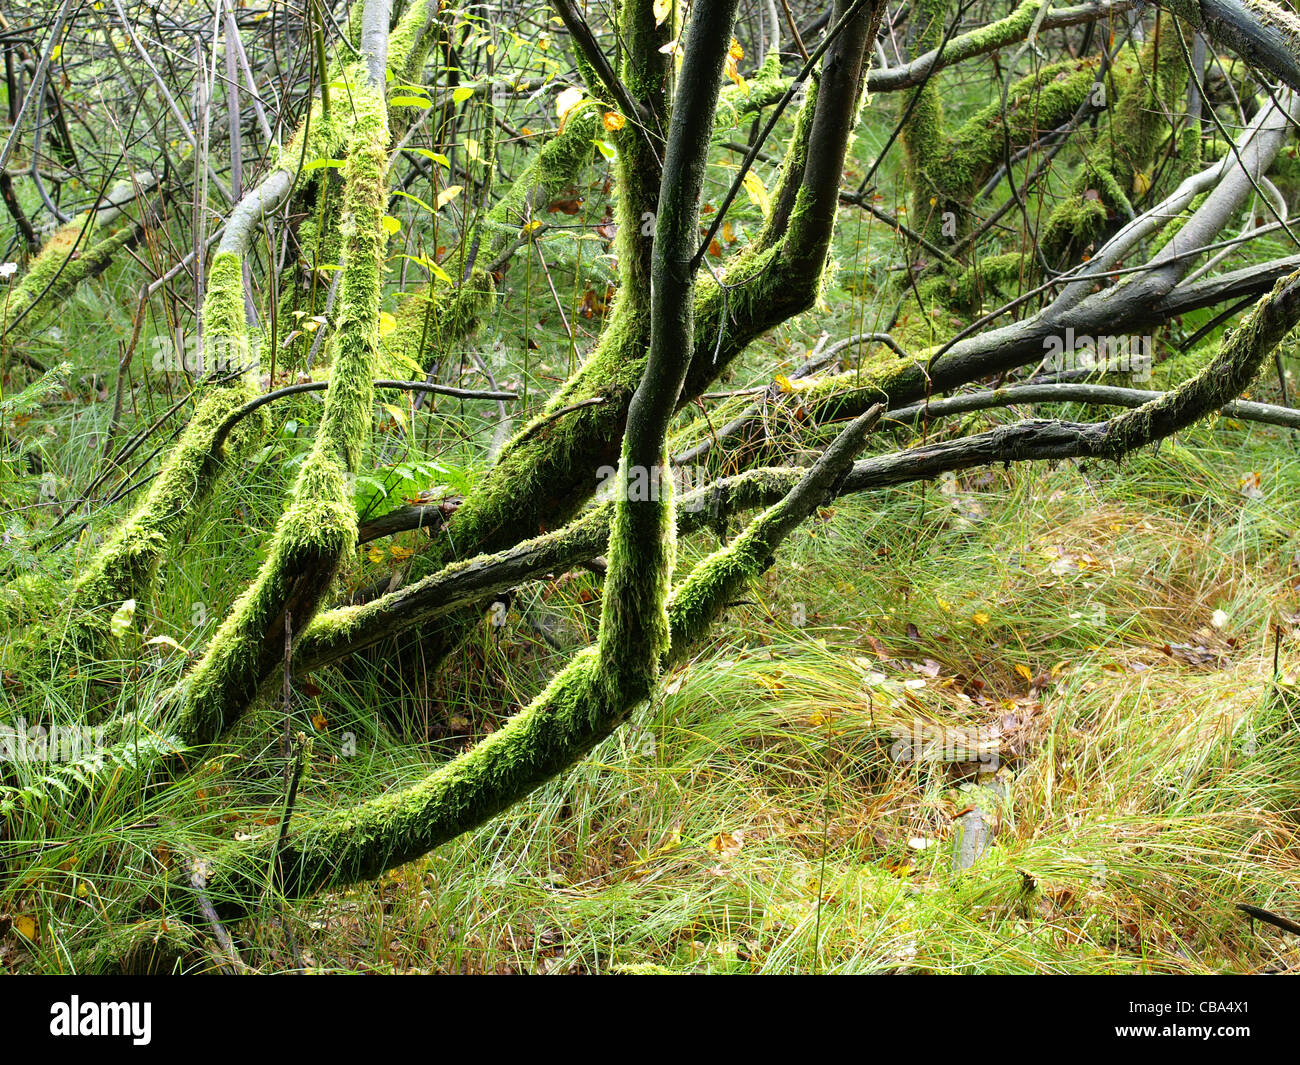 highmoor, hill moor, continental raised bag / Arracher Hochmoor / Bavarian Forest, Bavaria, Germany Stock Photo